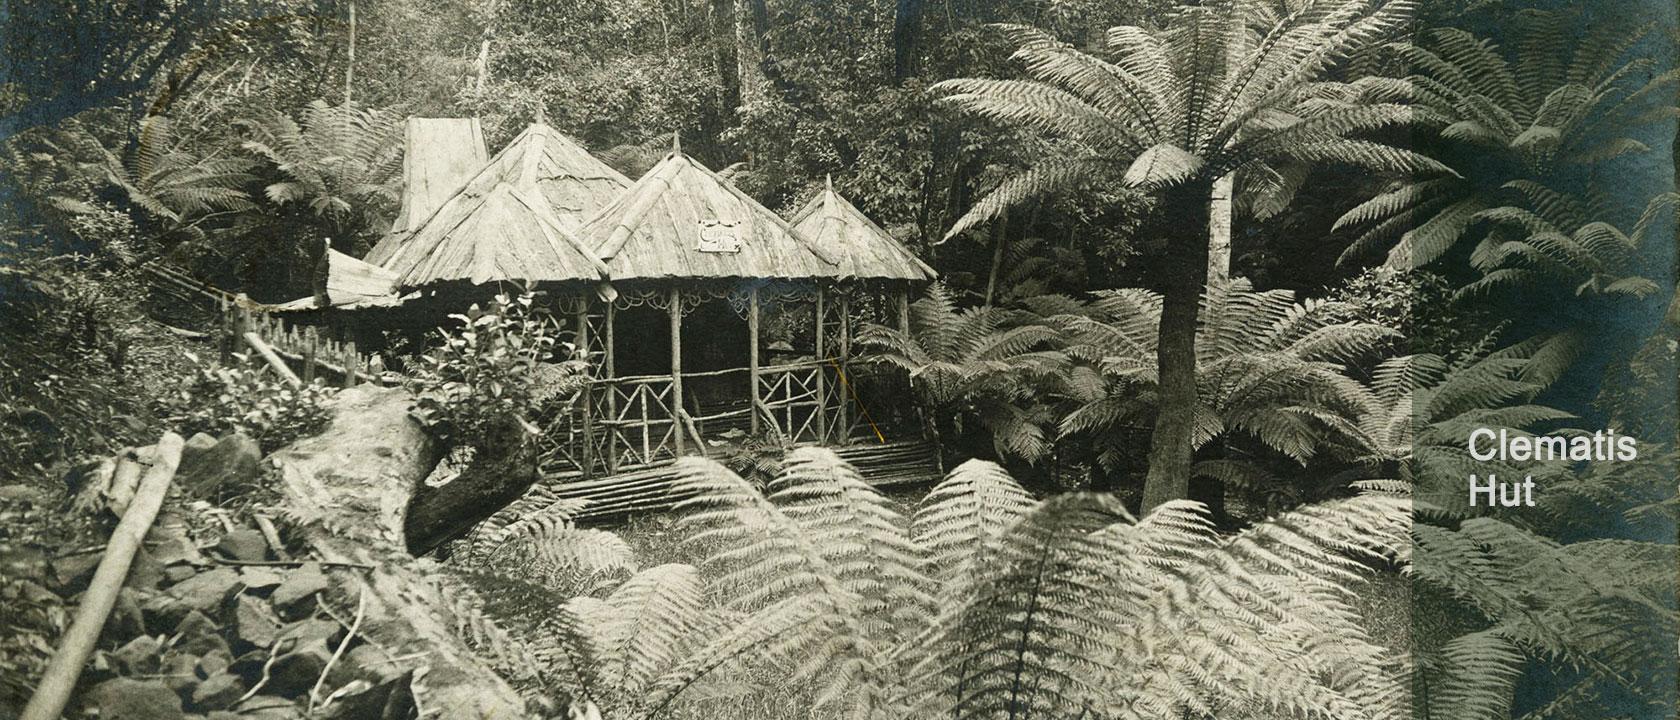 Clematis Hut